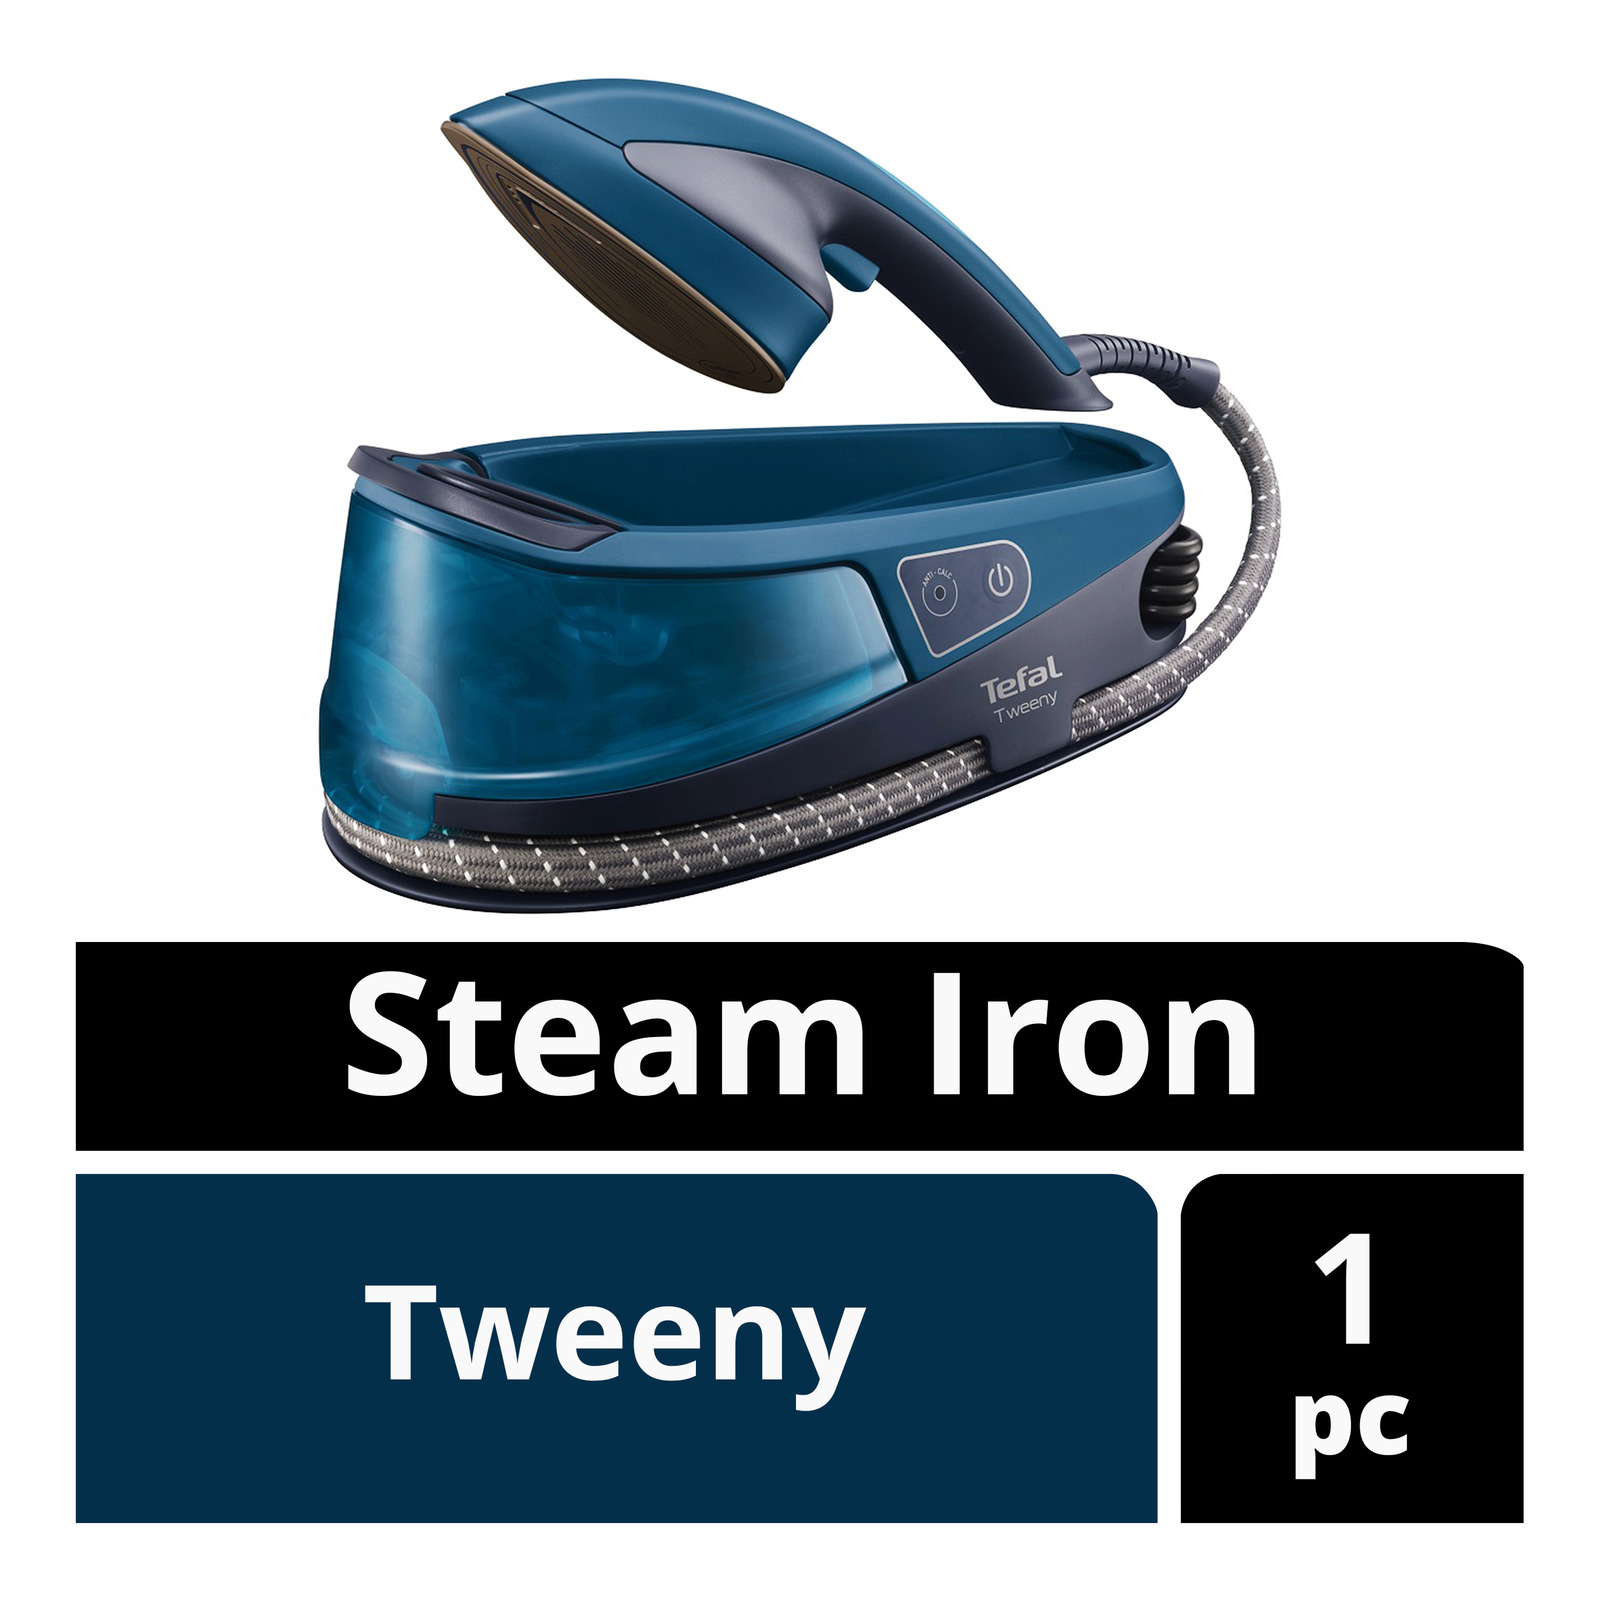 Tefal Steam Iron - Tweeny